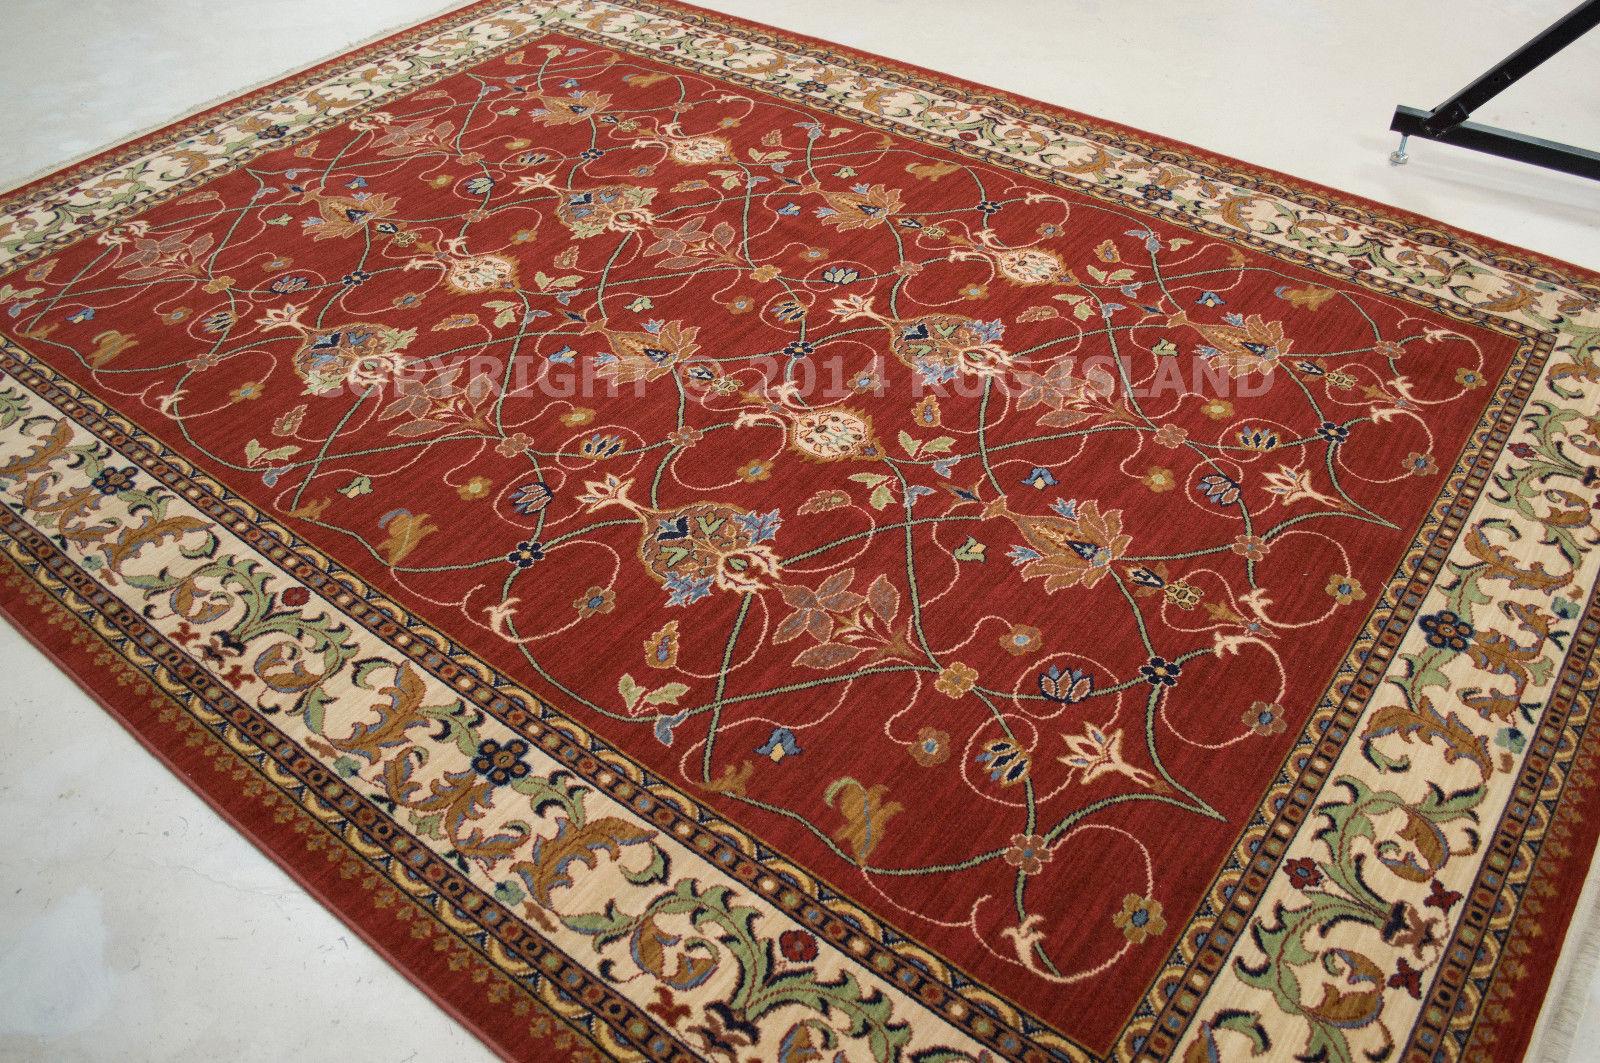 3x8 Karastan English Manor 2120 William Morris 00510 Red Wool Area Rug